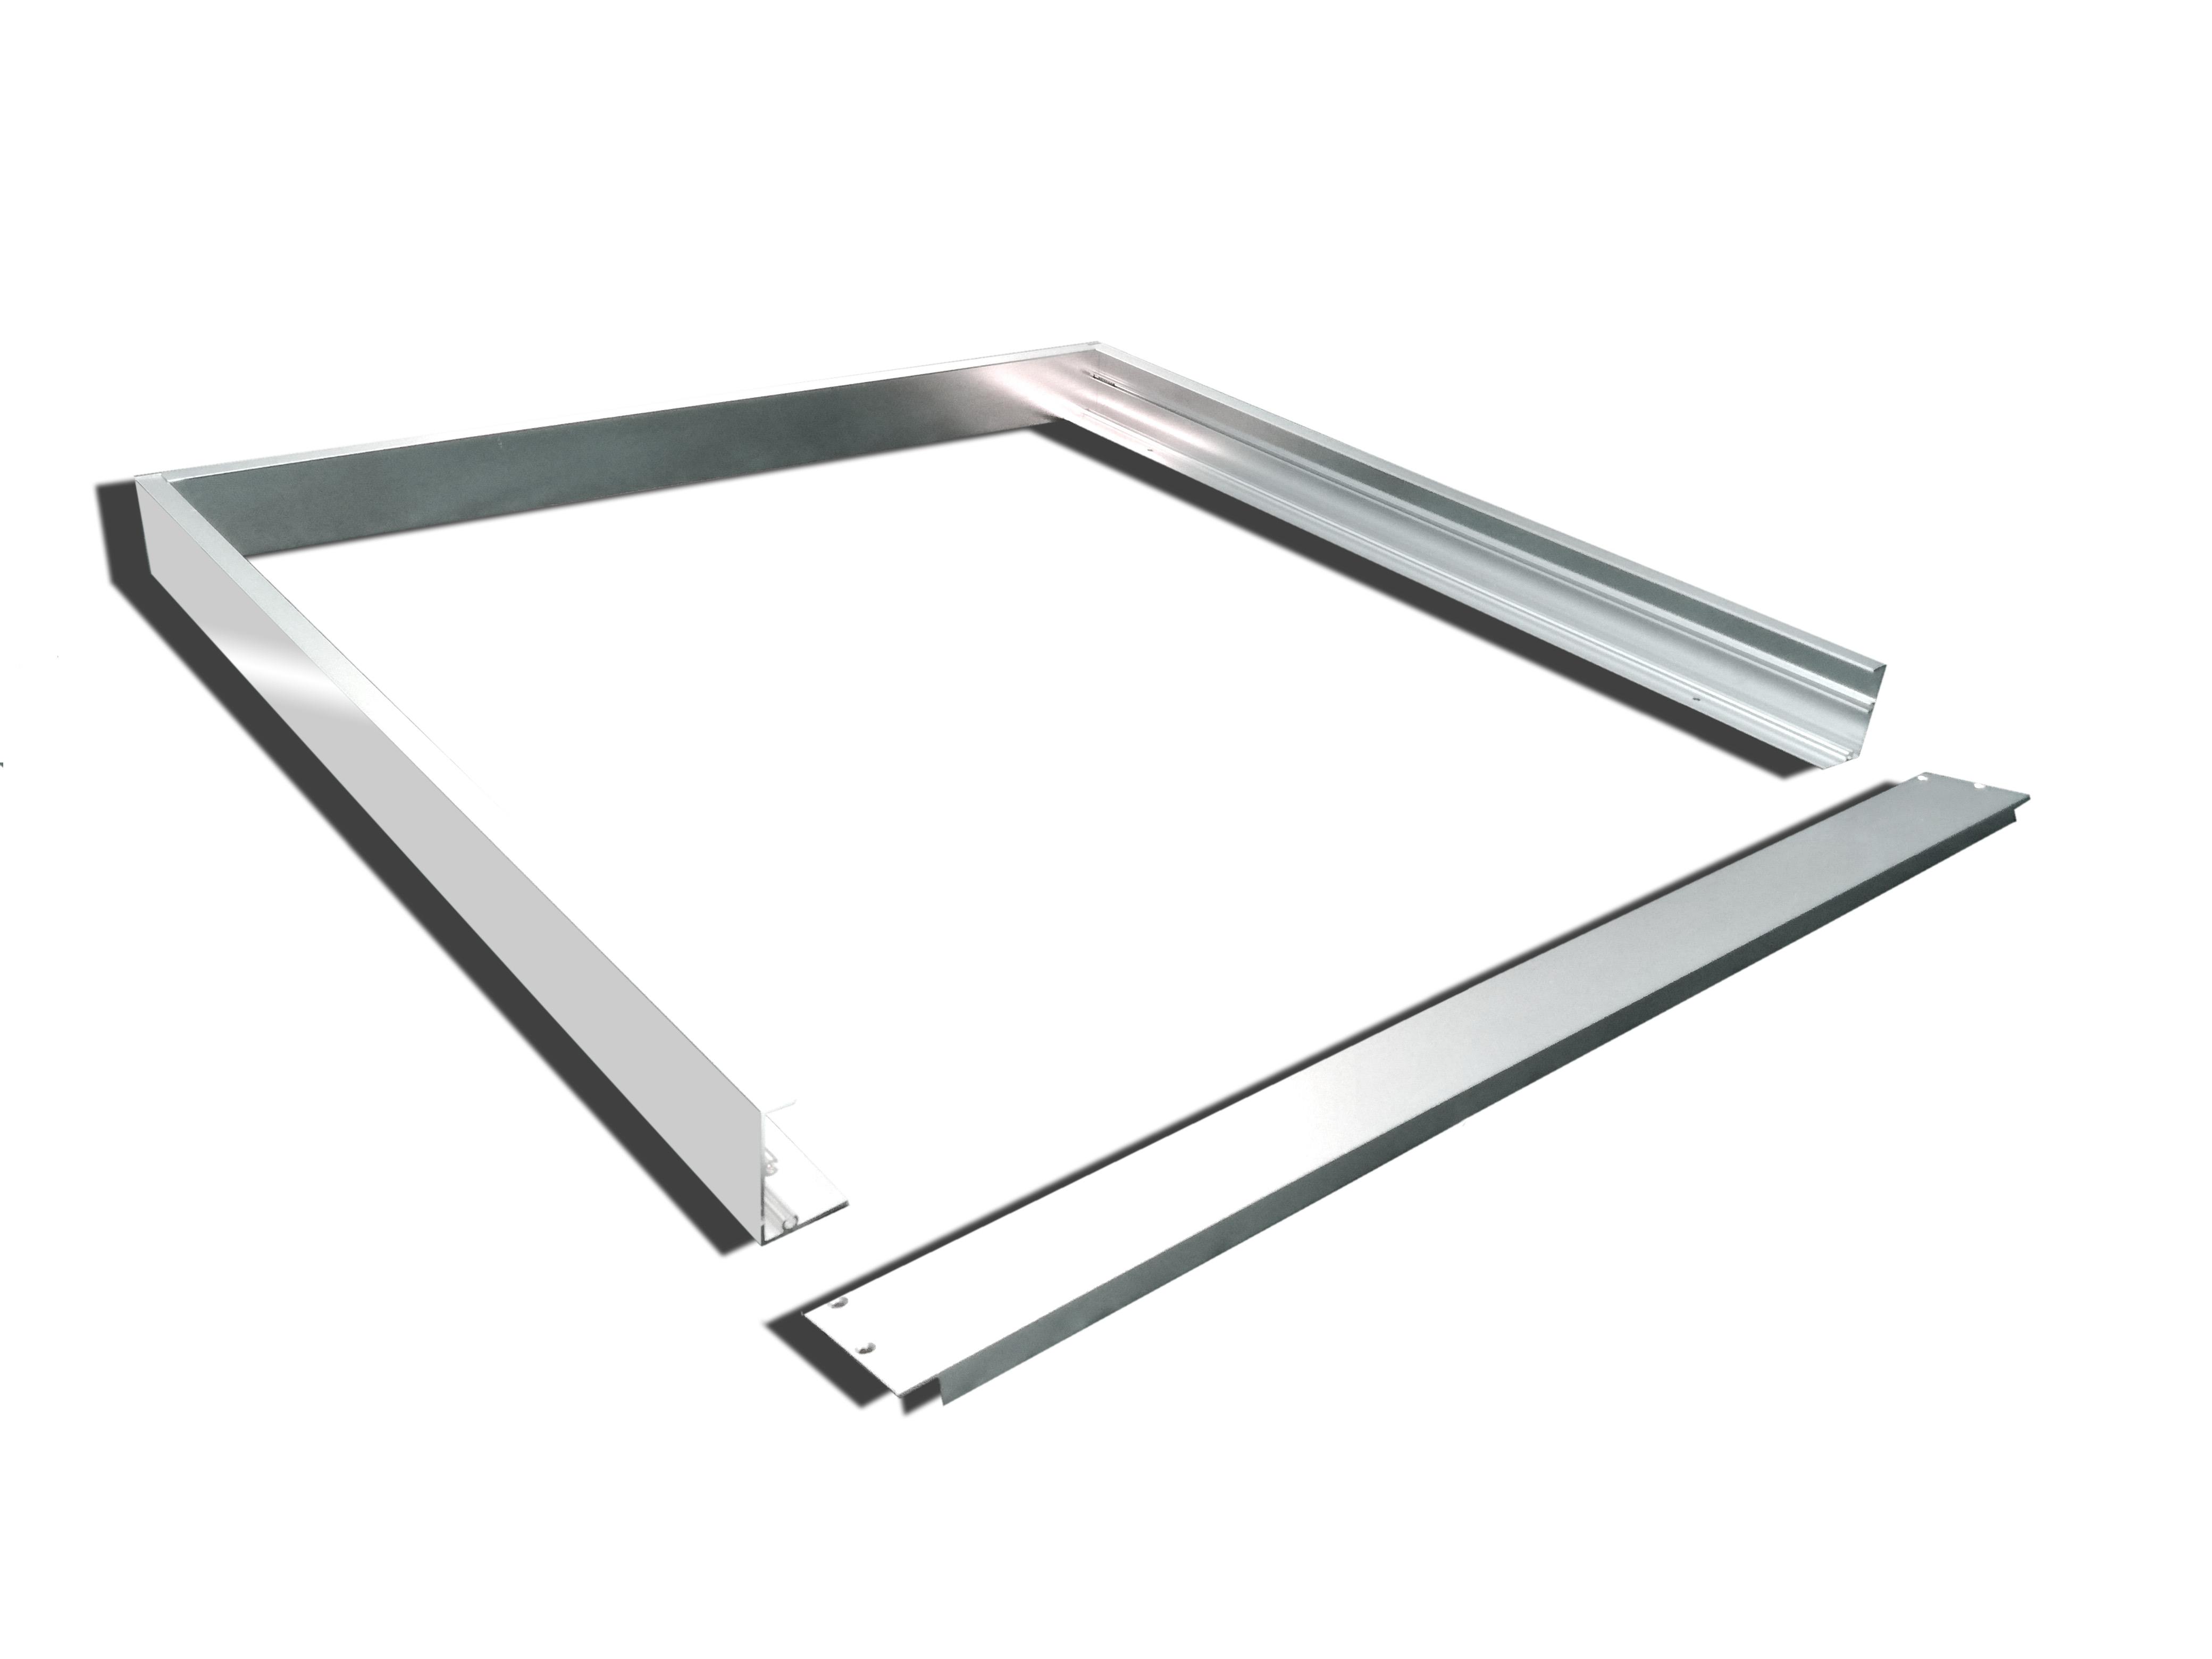 Extrem TXL24 - Alu Aufbaurahmen 60x60cm silberoxid für LED Panel für OW45